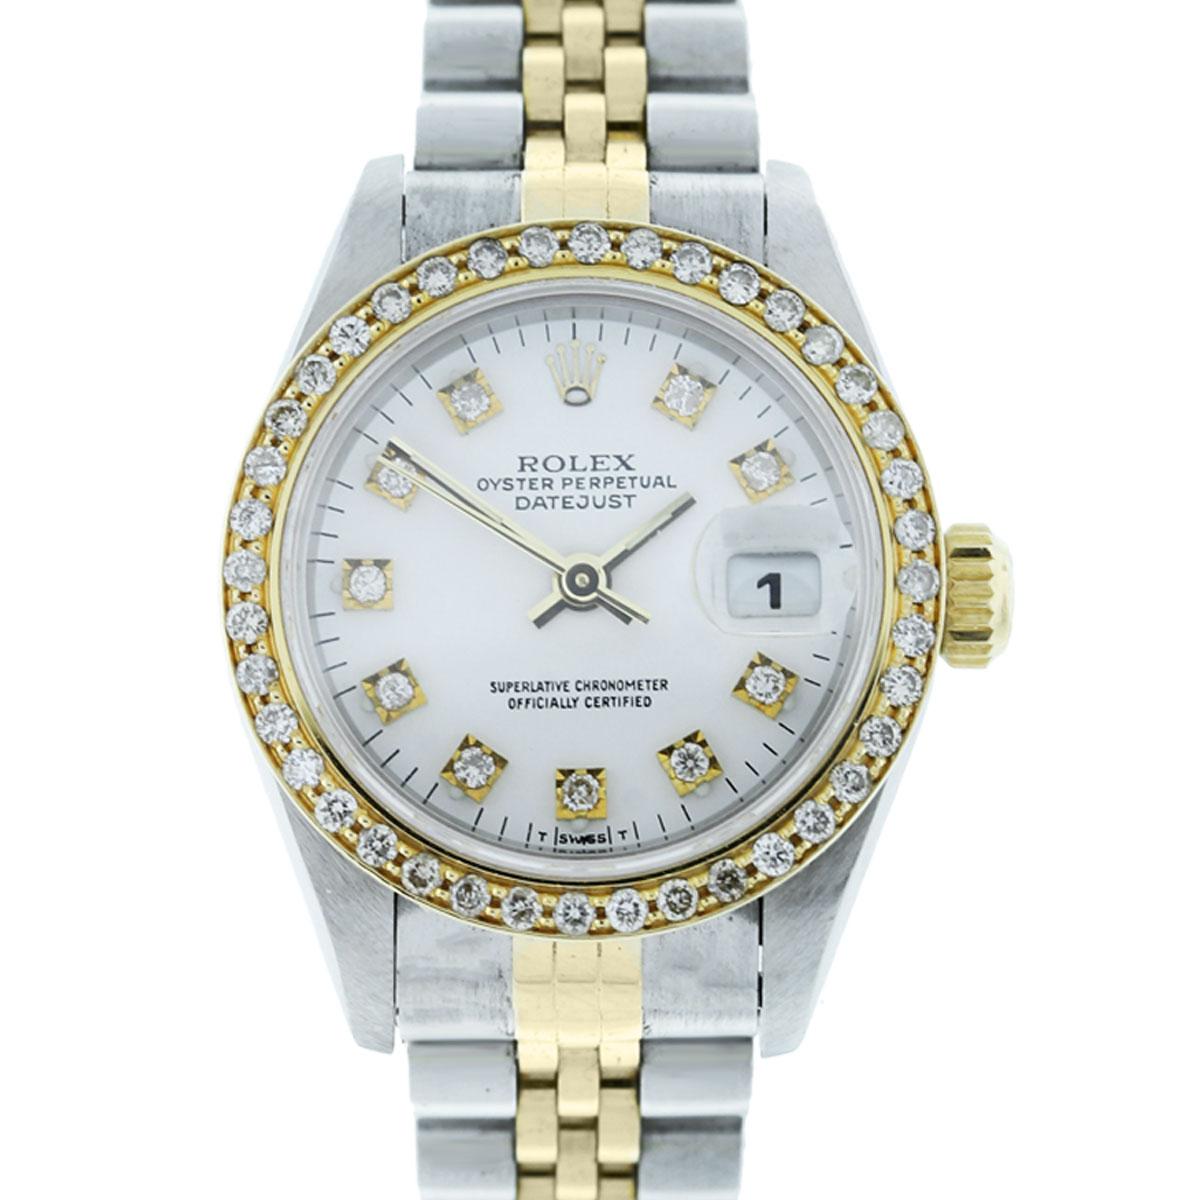 Rolex Datejust 69173 Diamond Dial Amp Bezel Ladies Watch